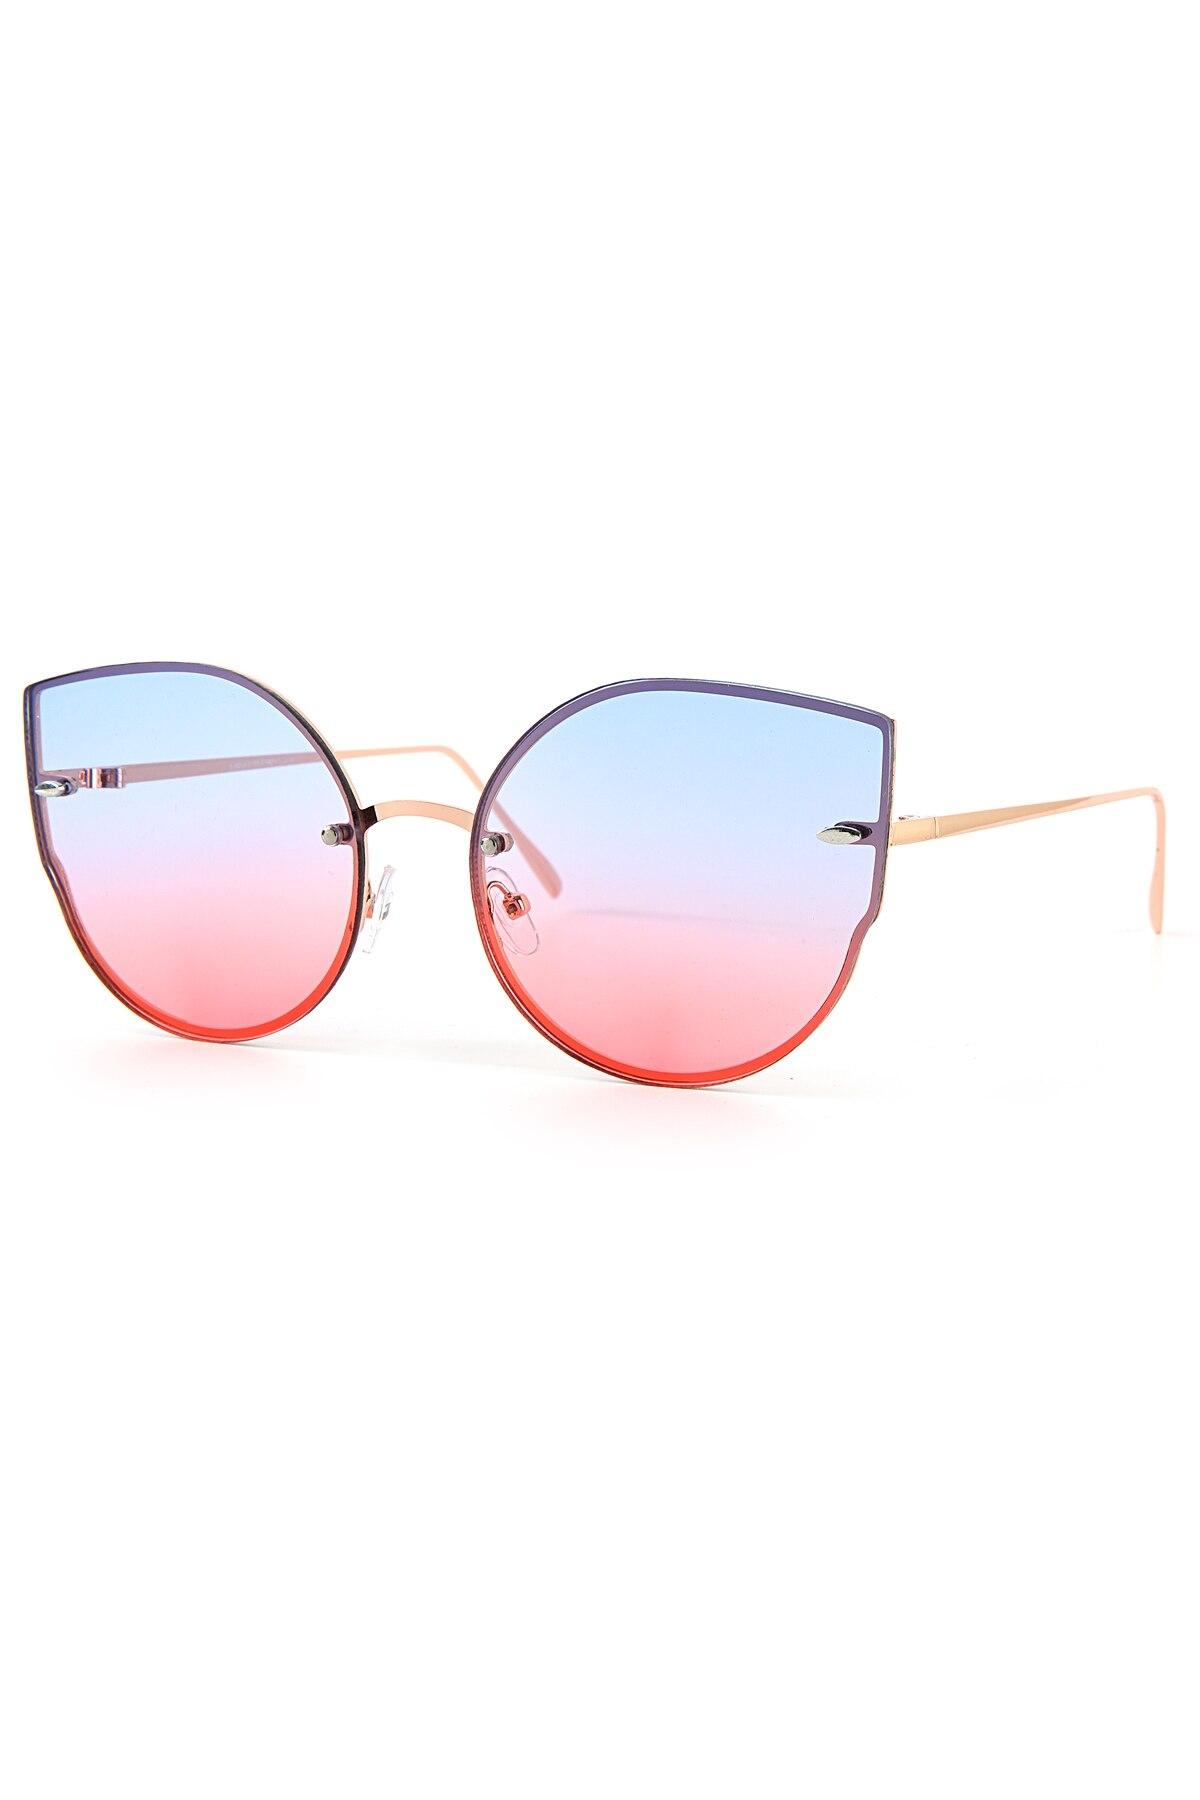 Aqua Di Polo APGS3-G5573-KMO4M Women/Girl Sunglasses